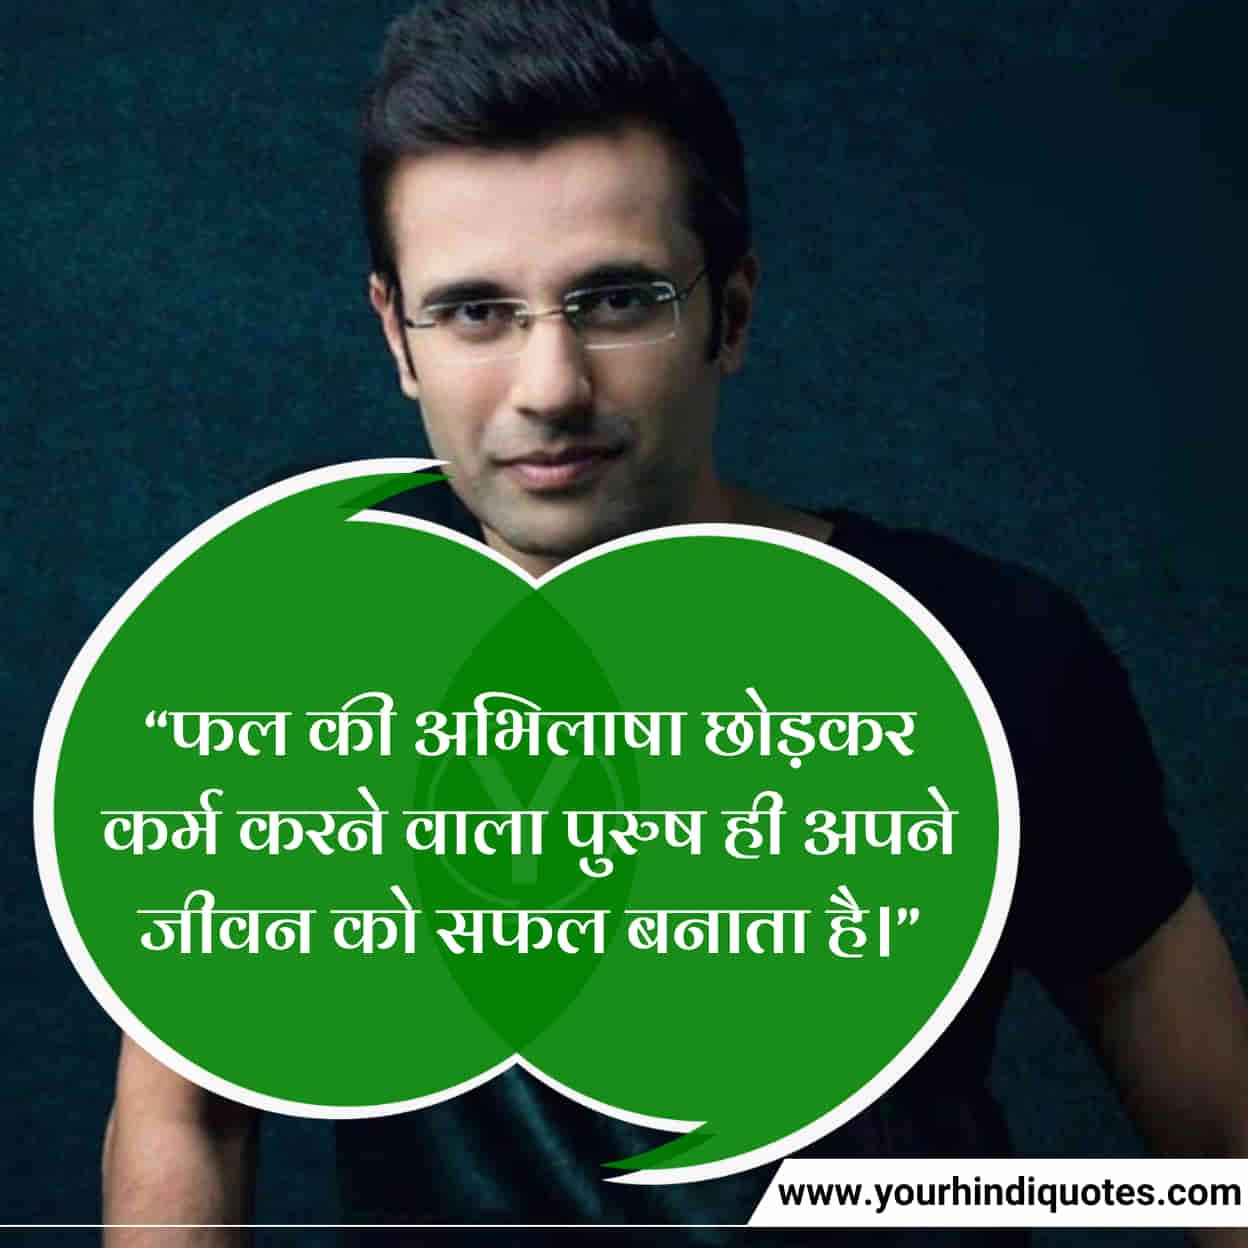 Bhagwat Gita Success Hindi Quotes